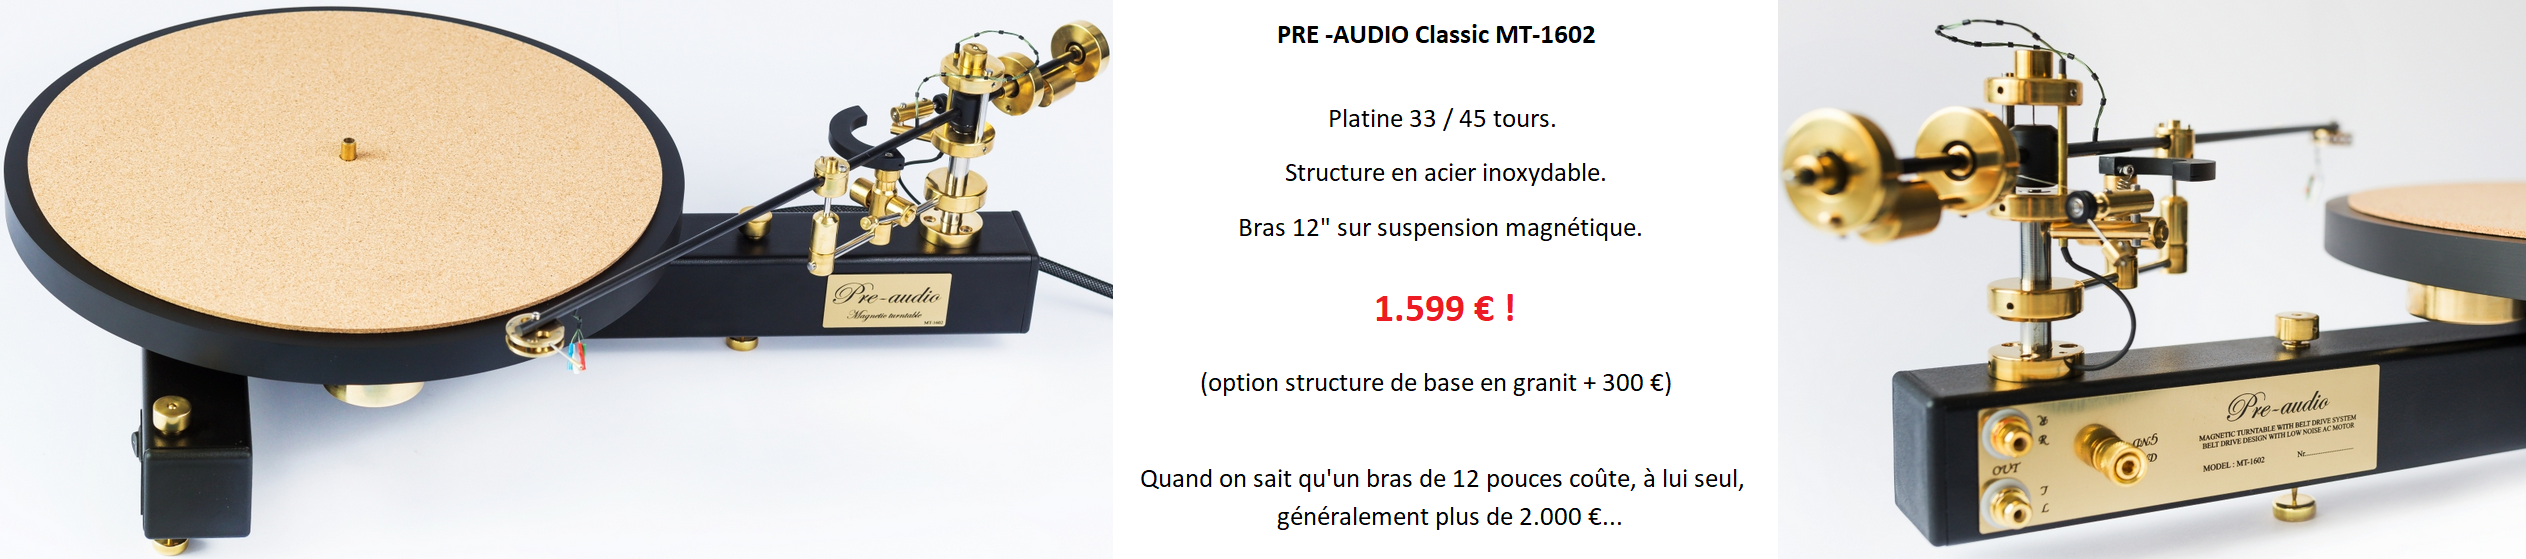 PreAudio1602